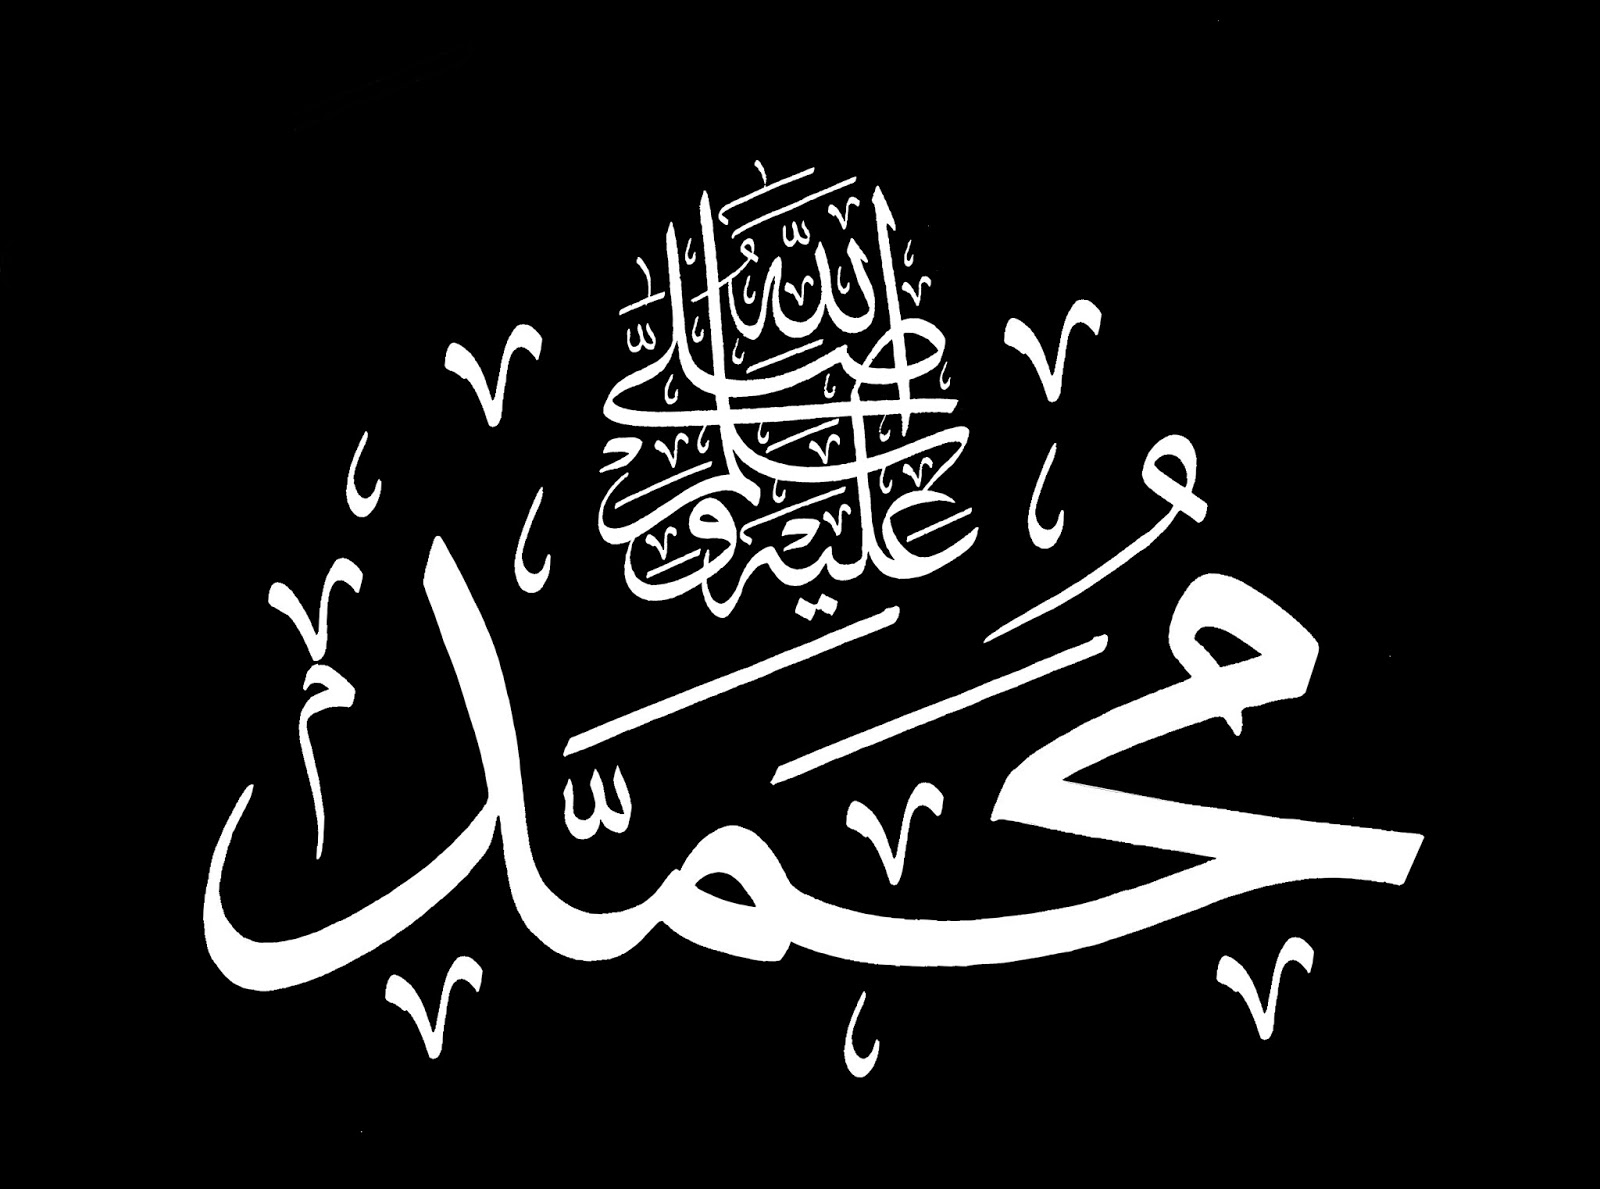 download allah muhammad wallpaper hd wallpapersjpg [1600x1189 1600x1189